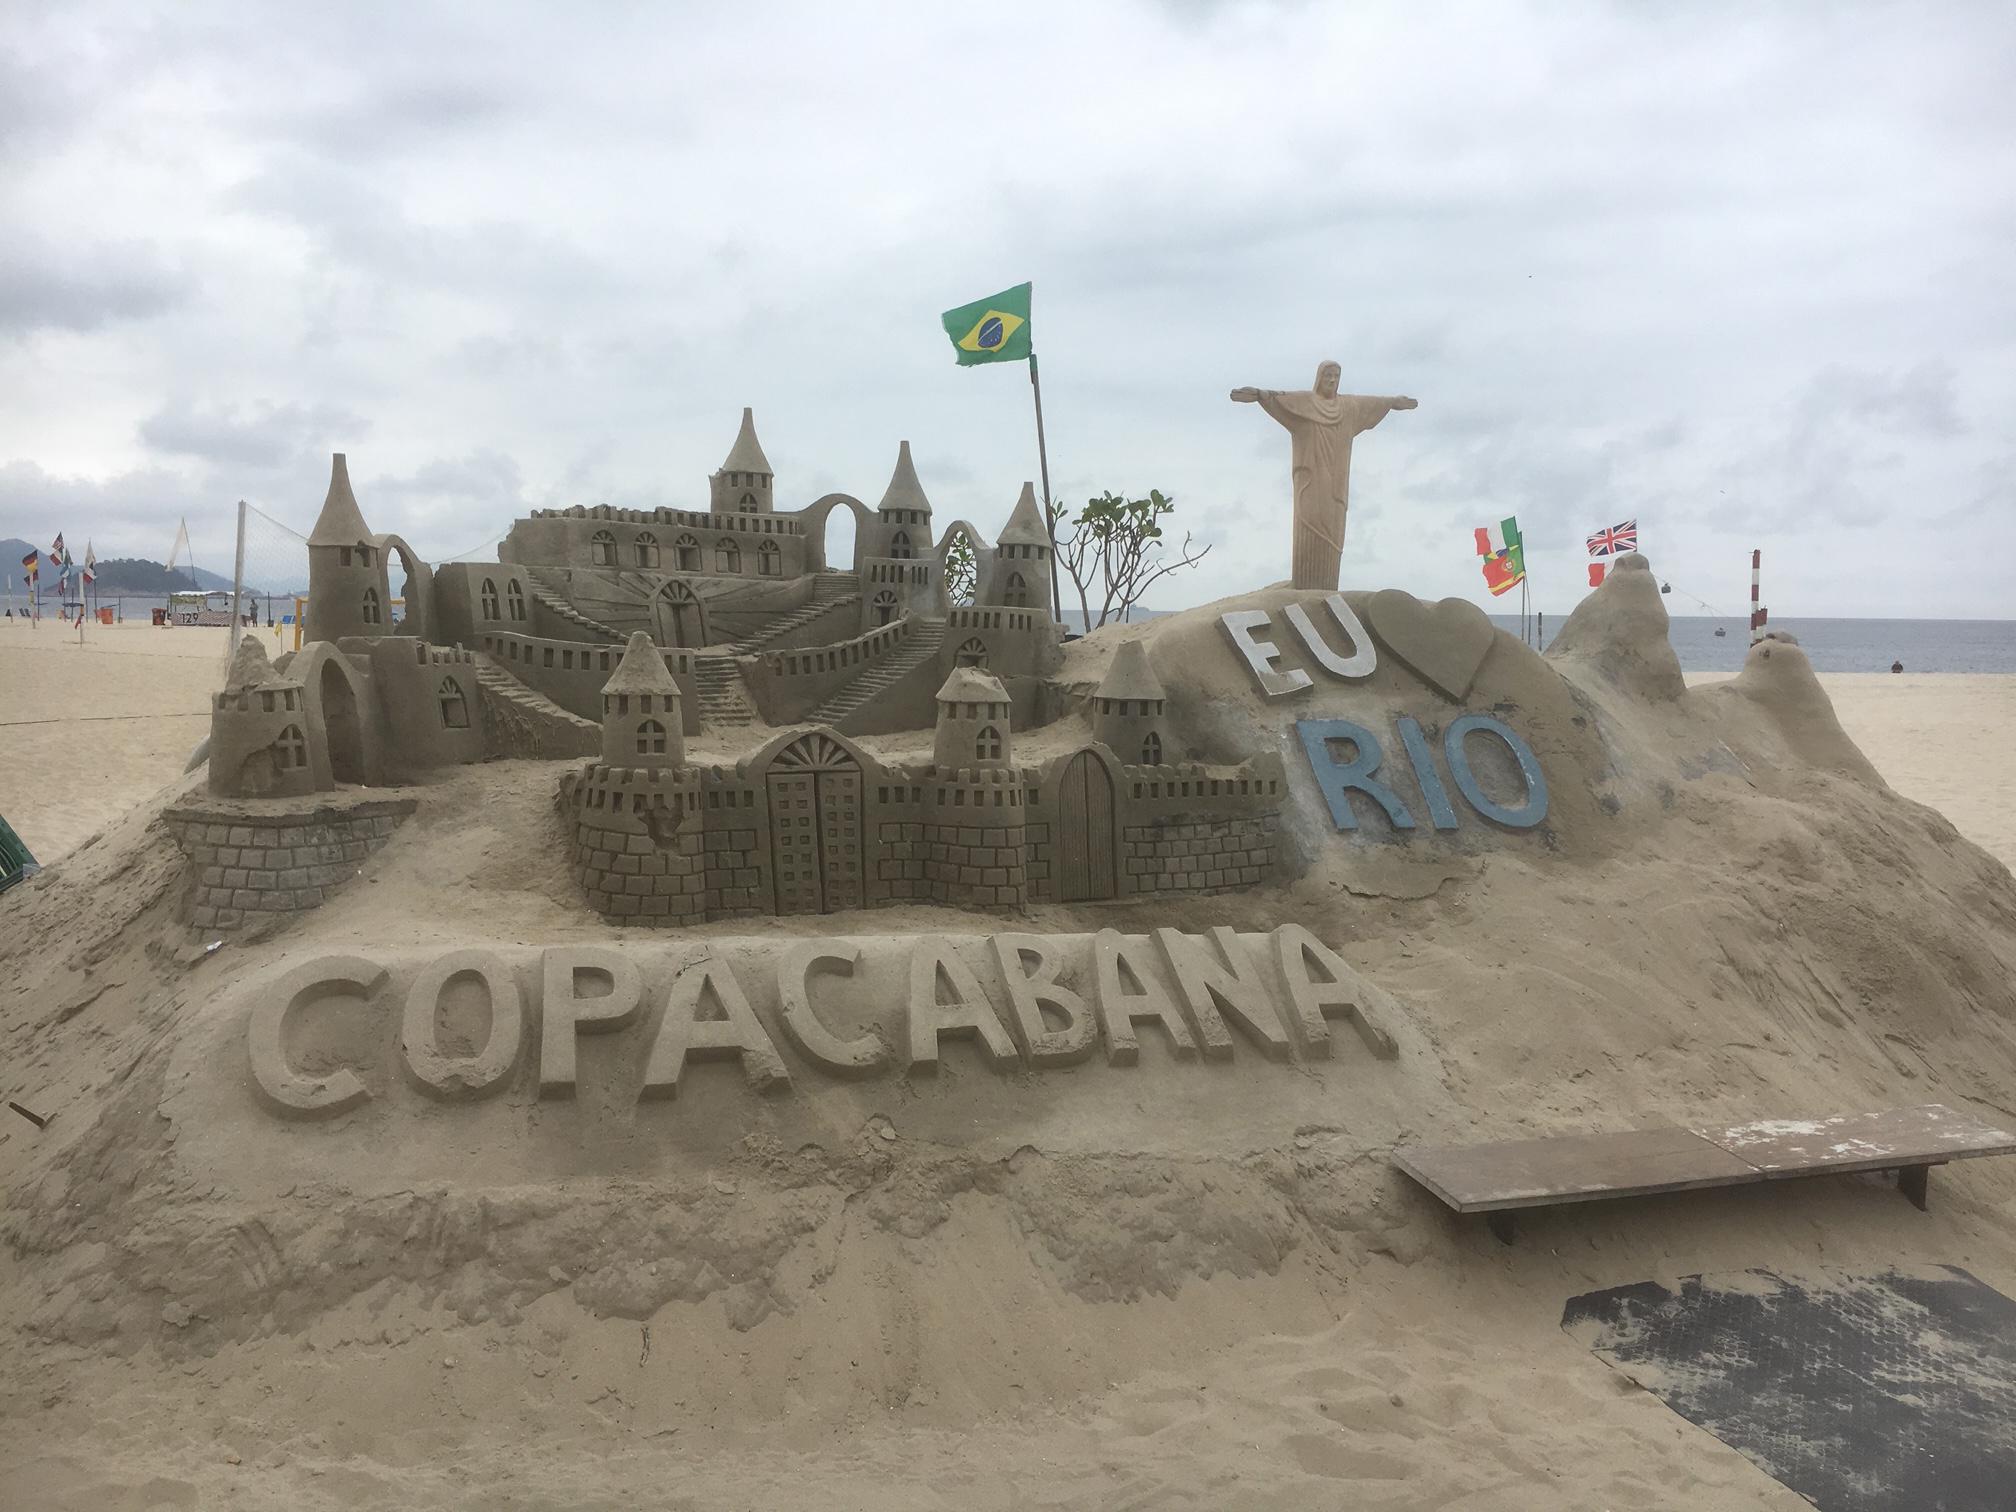 "Brazil_copacabana_007"""""